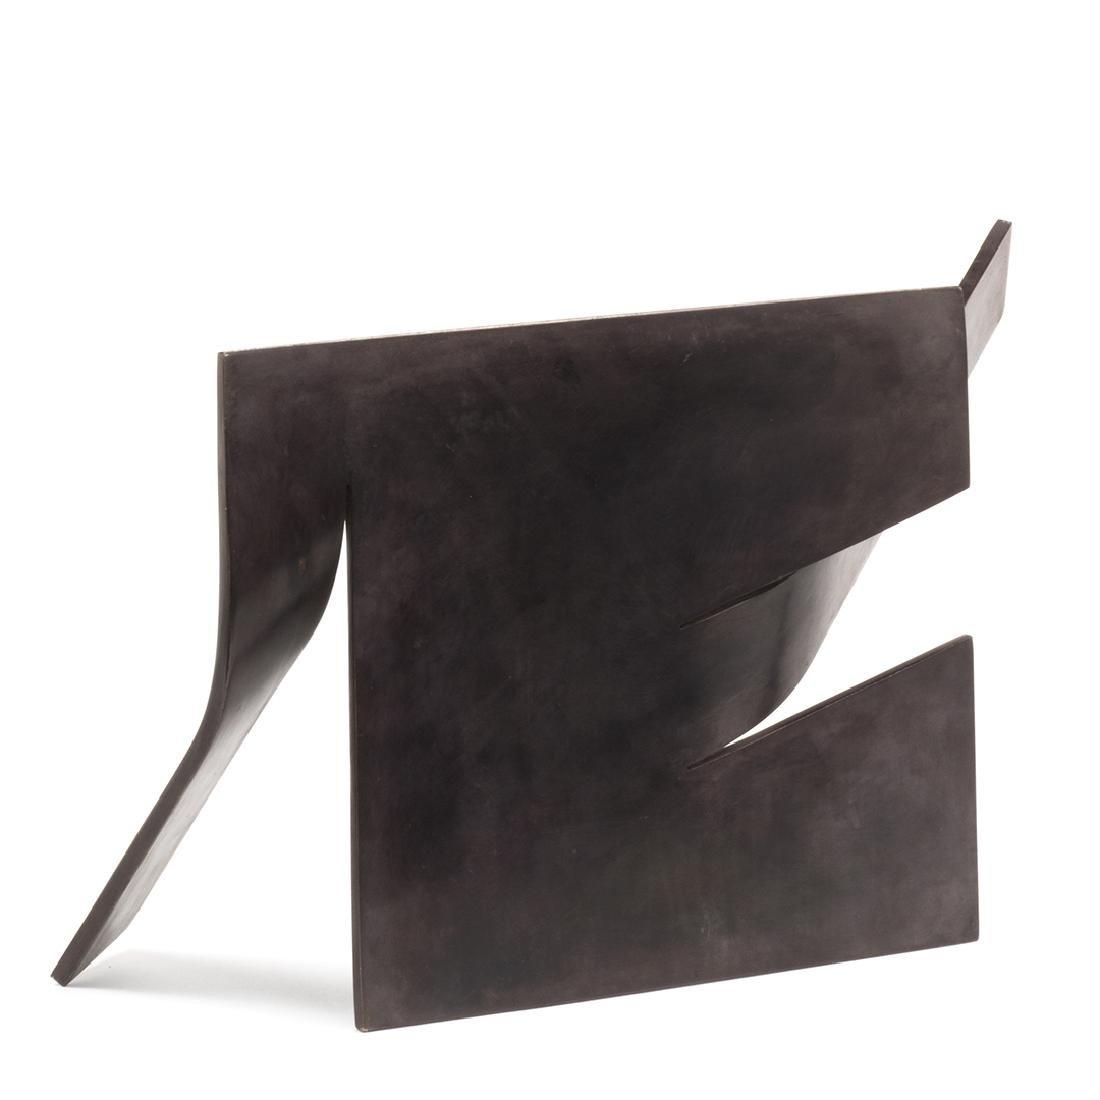 Abstract Bronze Sculpture